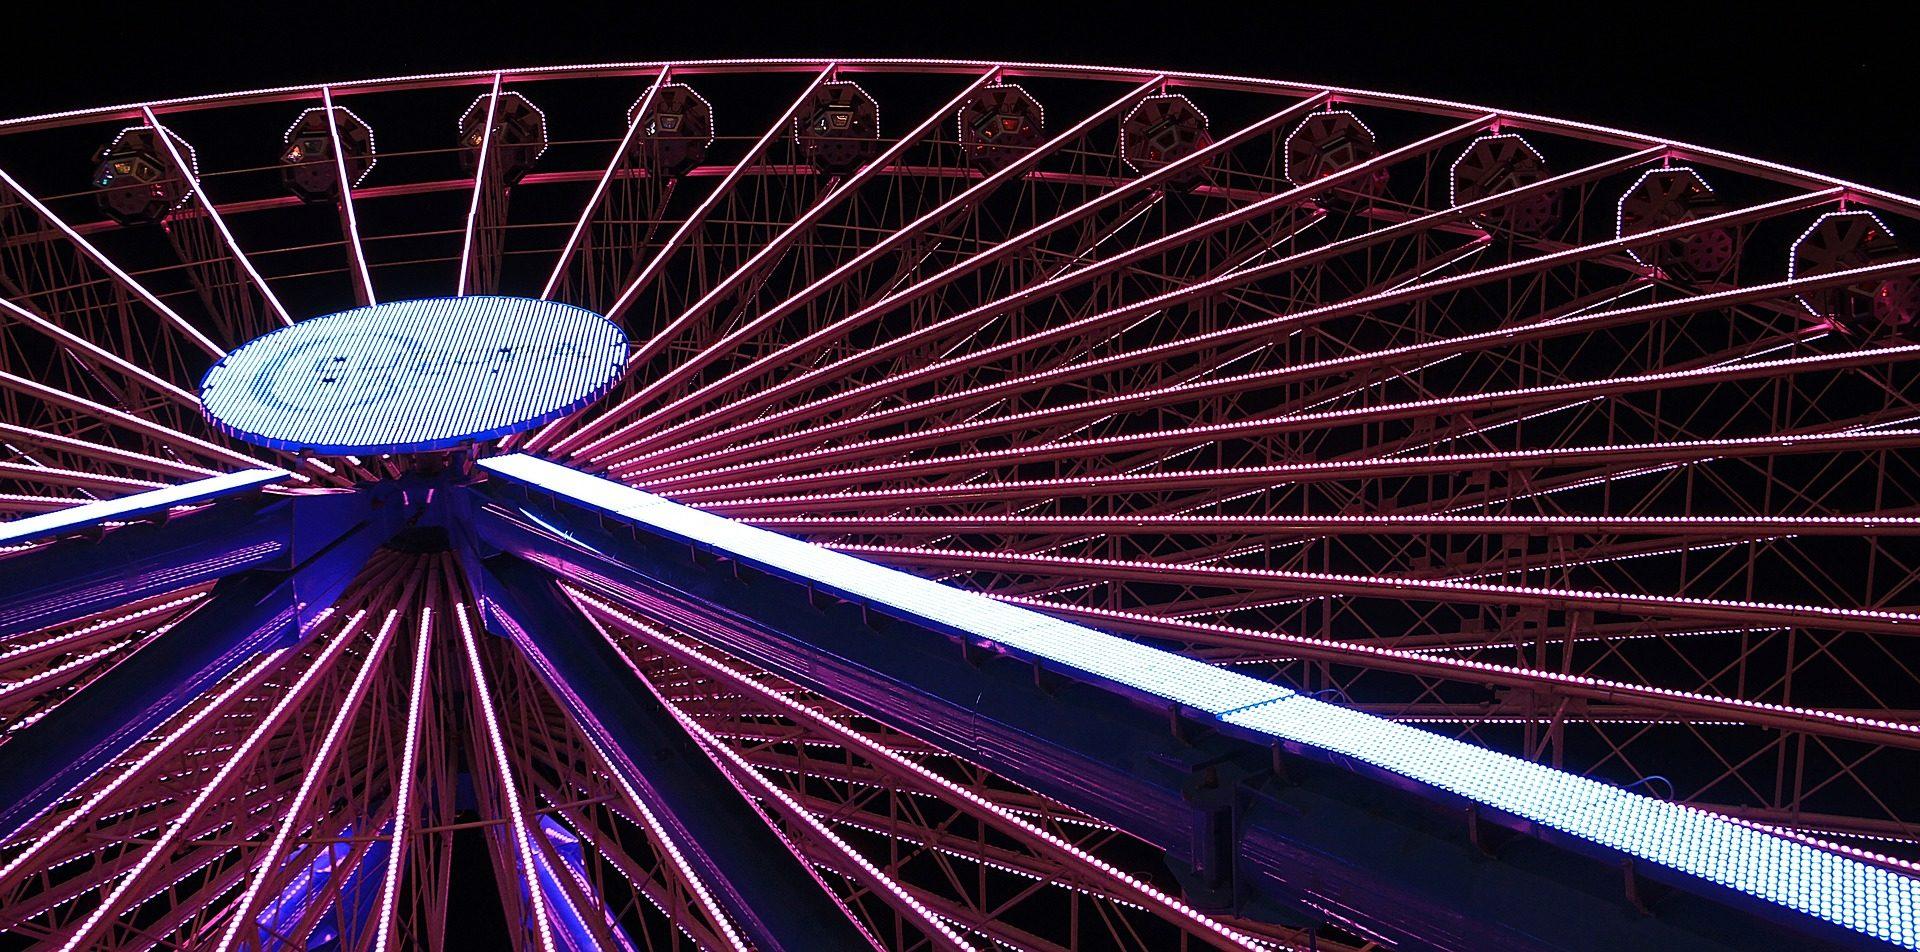 Grande roue, juste, attraction, amusement, coloré - Fonds d'écran HD - Professor-falken.com